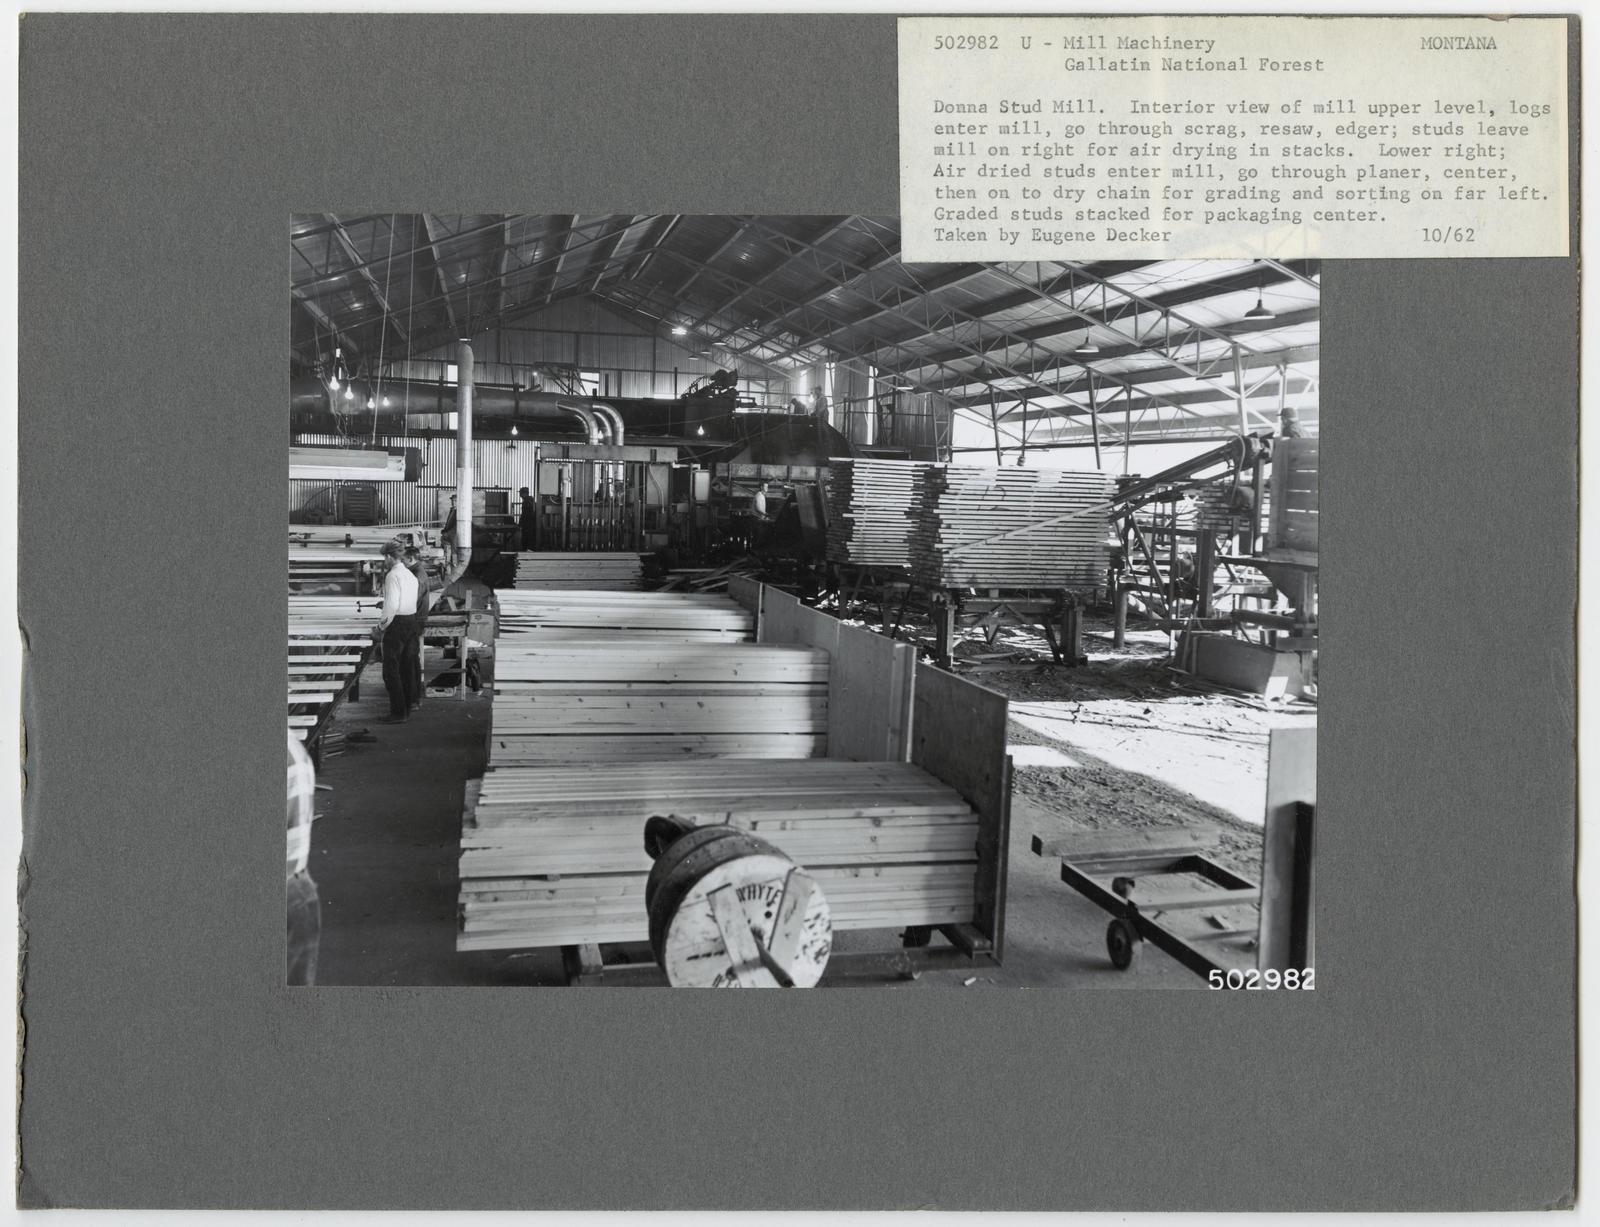 Sawmill Interiors - Montana